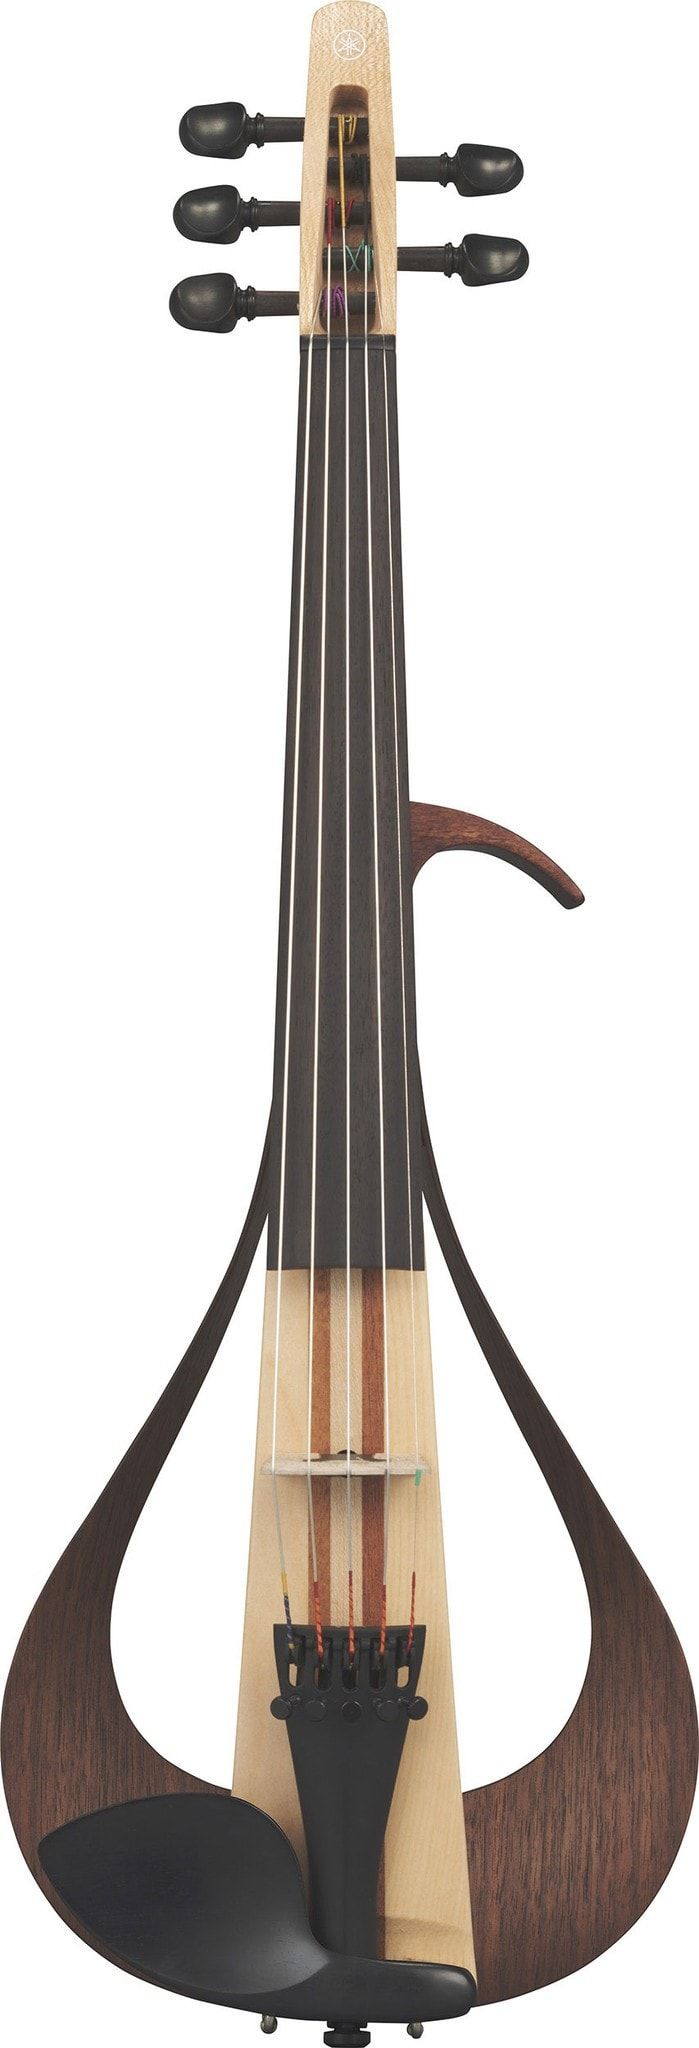 Yamaha YEV-105 5-String Electric Violin